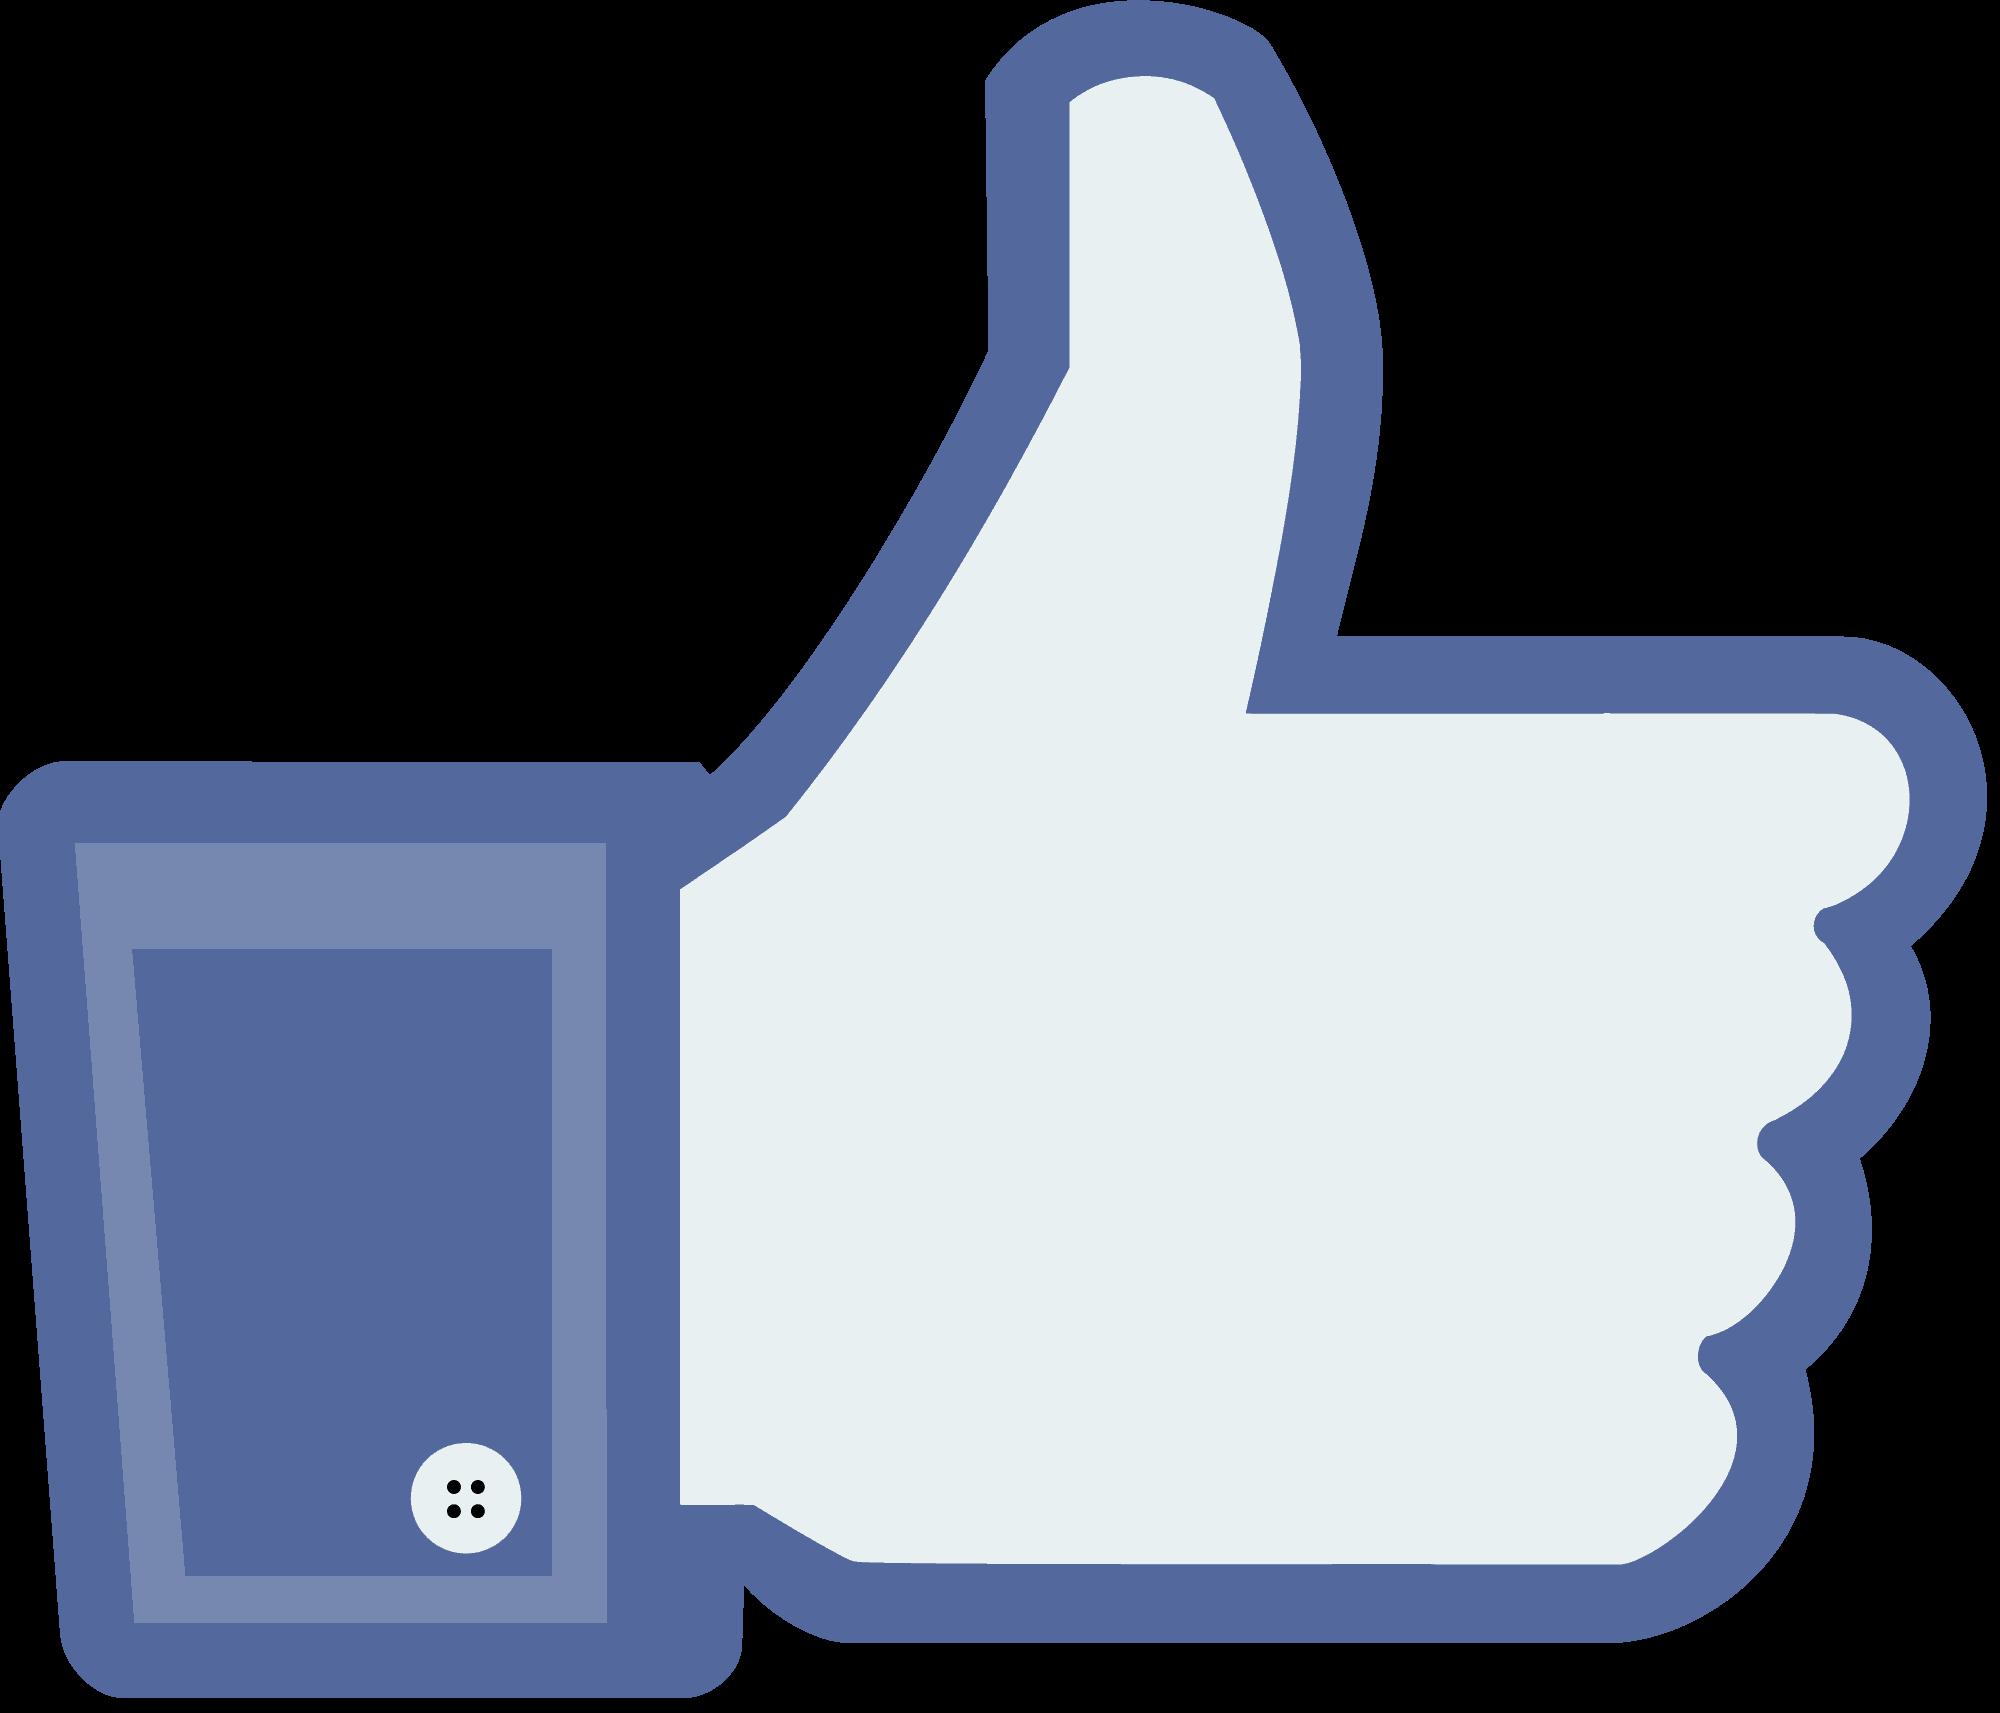 [AUTO LIKE] Facebook এ অটো Like নিতে চাচ্ছেন কিন্তু পারছেন না??? এখন থেকে Unlimited অটো Like নিন। সবাই পারবেন। [100% Working][with Screenshot] [A to Z] ? By Masud Rana